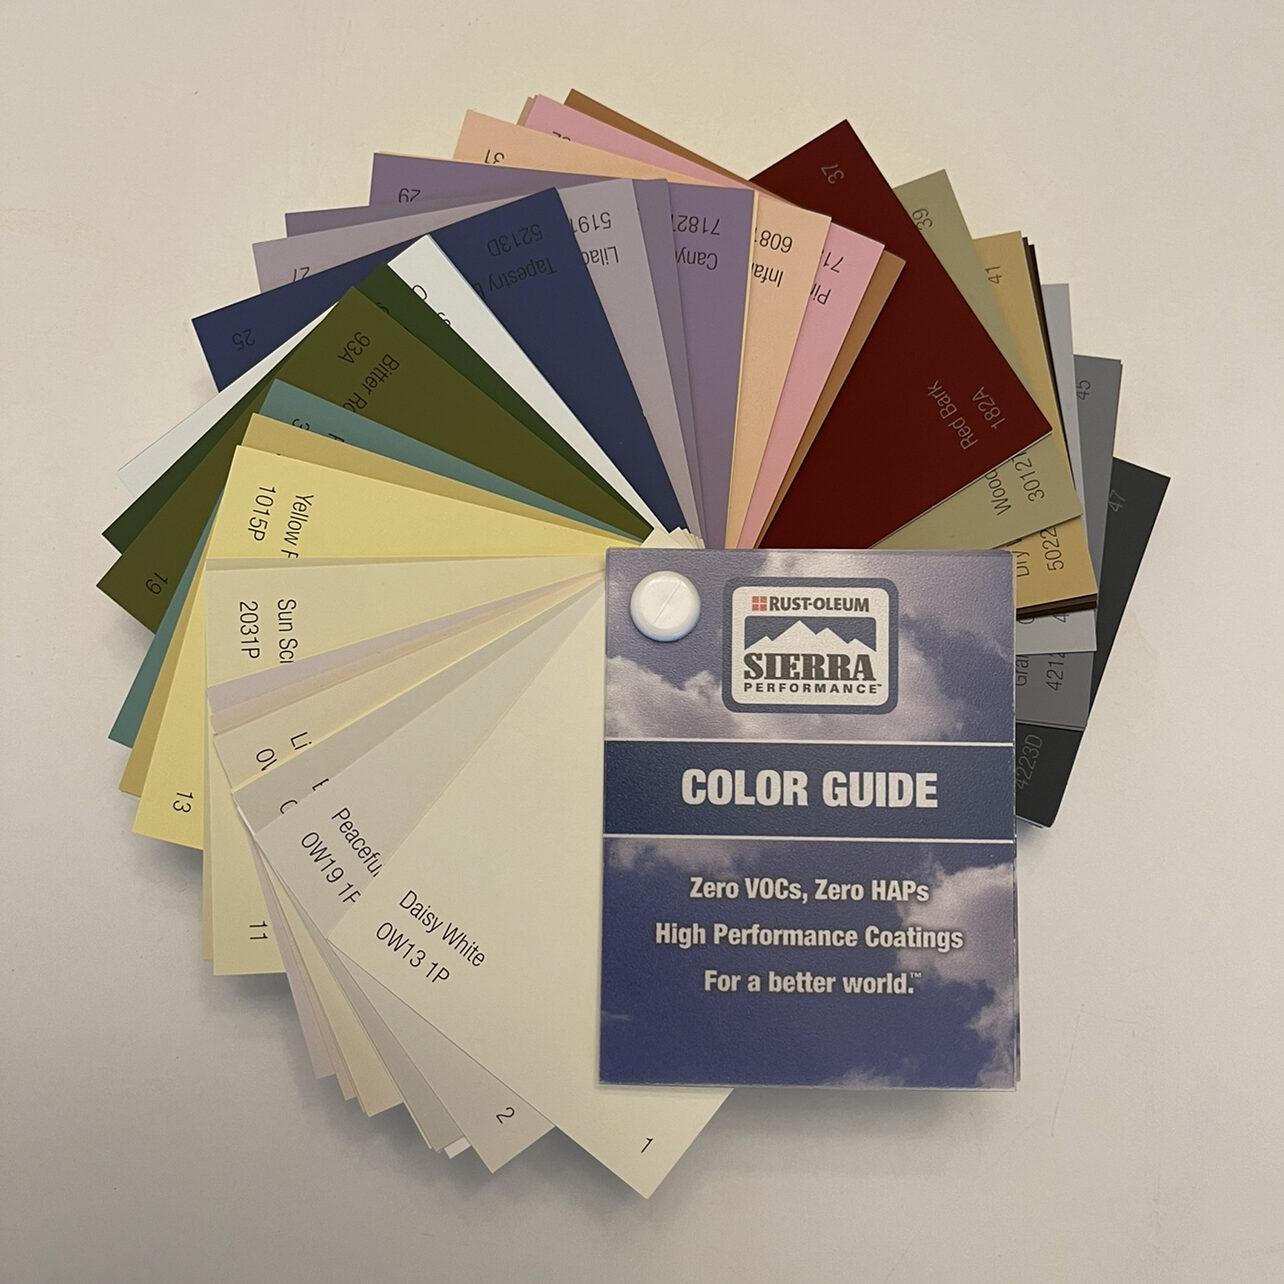 RustOleum Sierra Color Guide